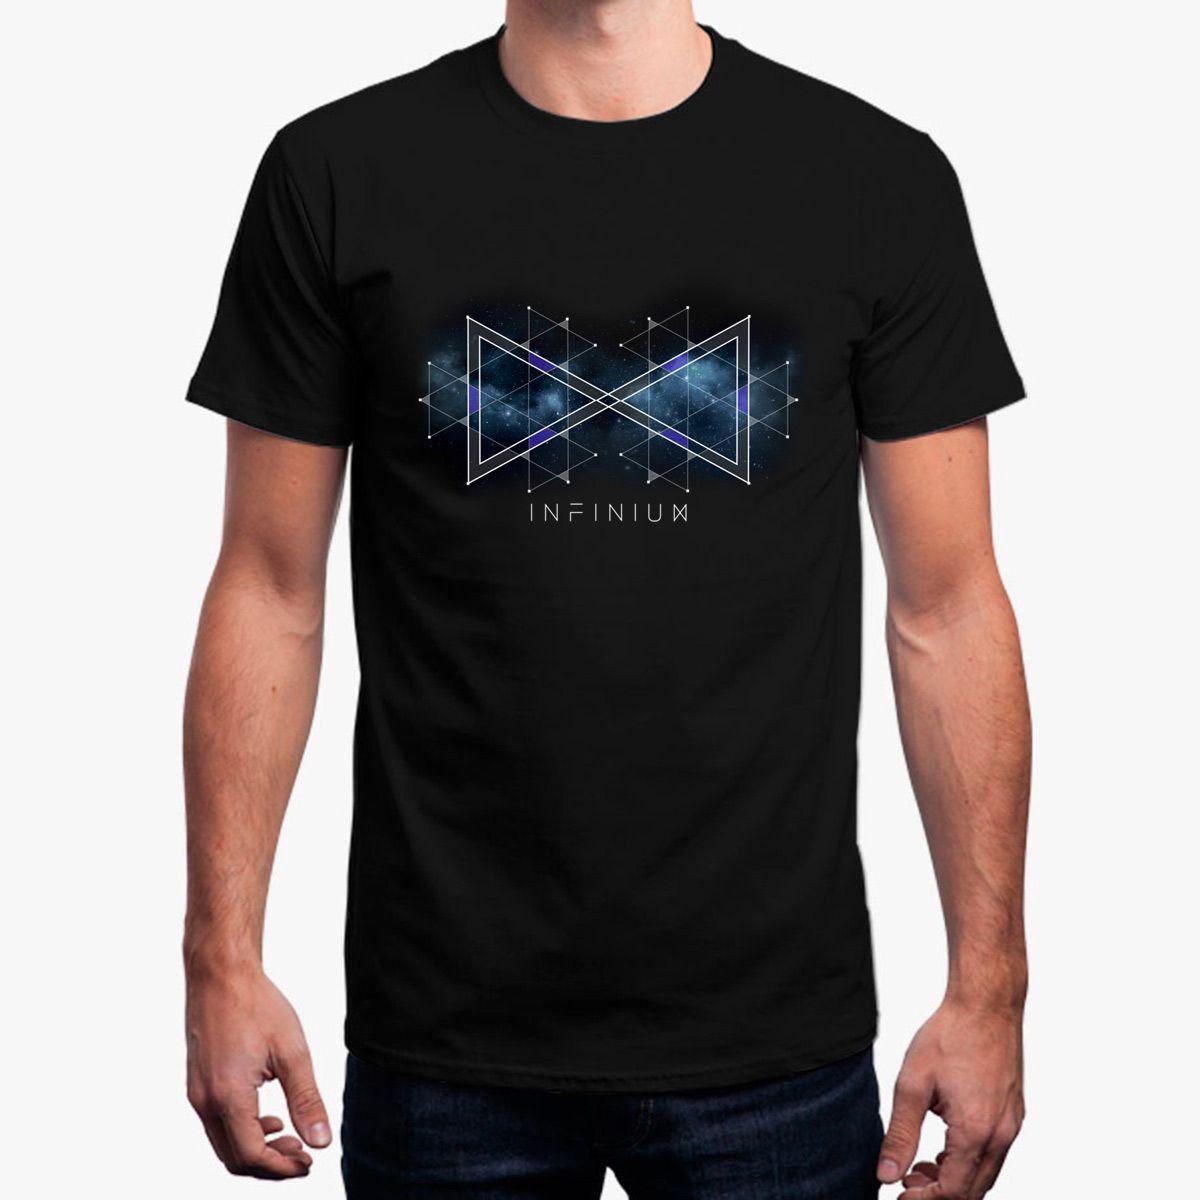 Top Quality Infinium Galaxy Print T Shirt Cool Cotton Tshirt Mens